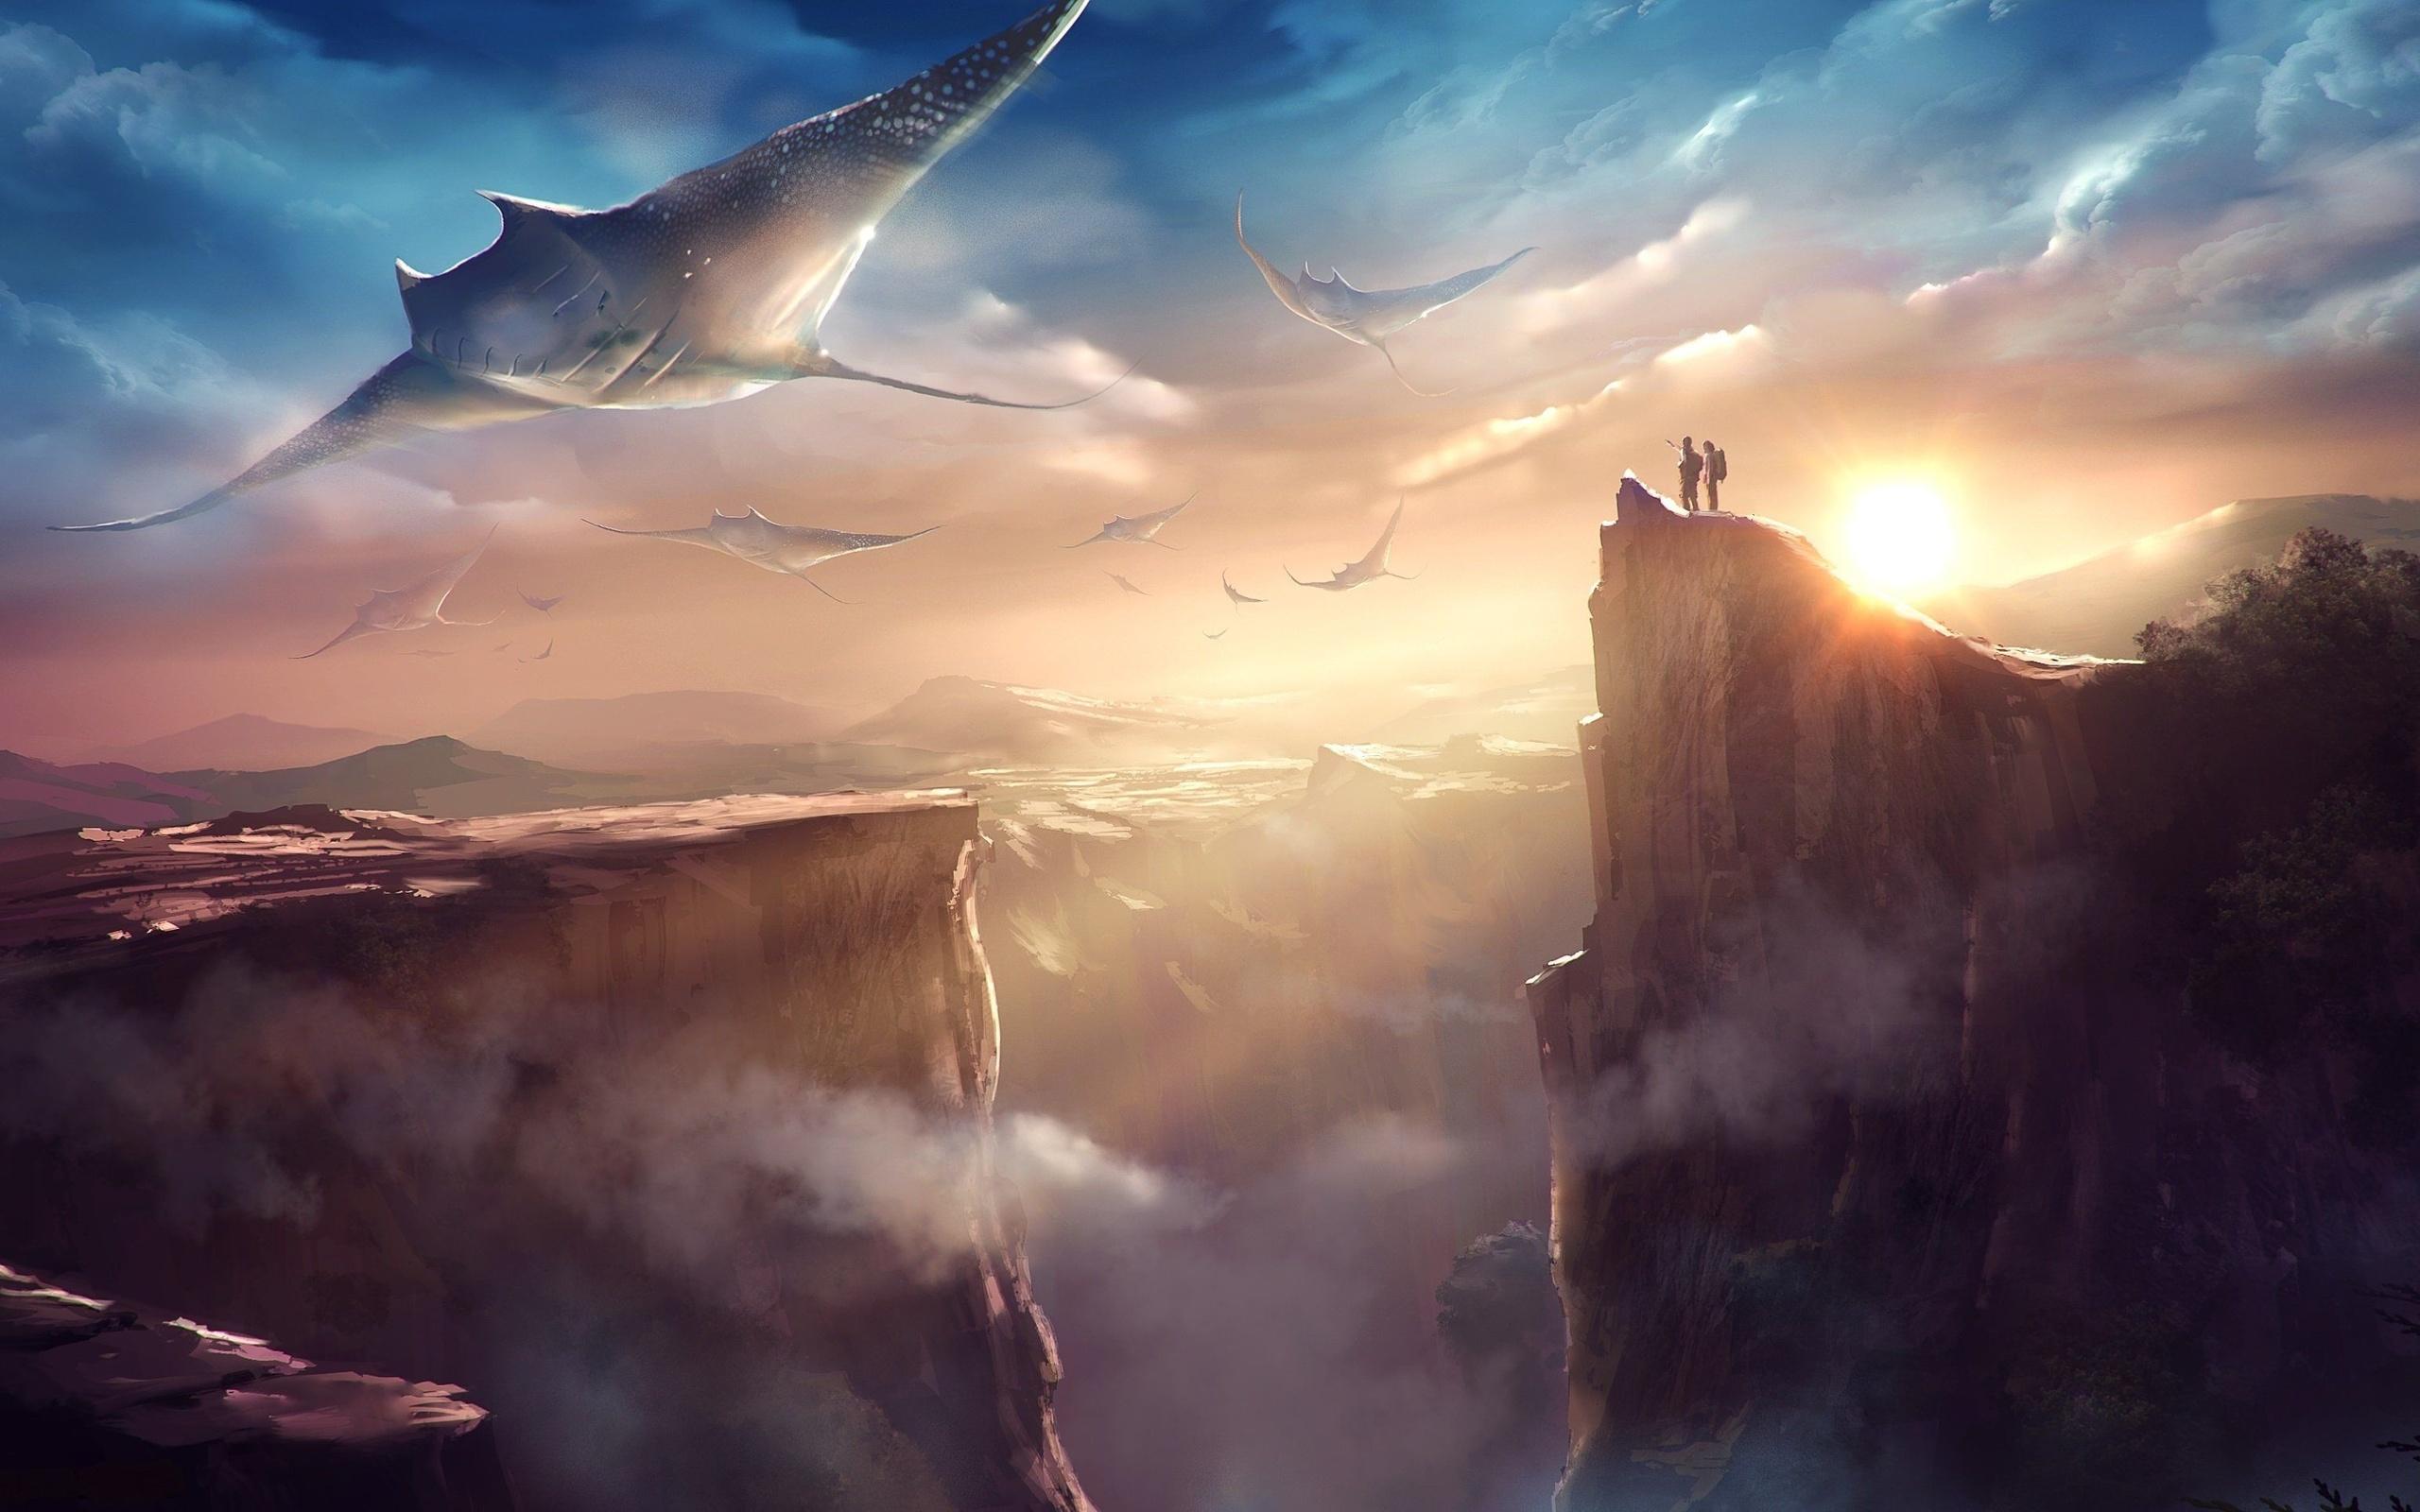 горы, скат, скалы, солнце, облака, мир фантазий, фэнтези